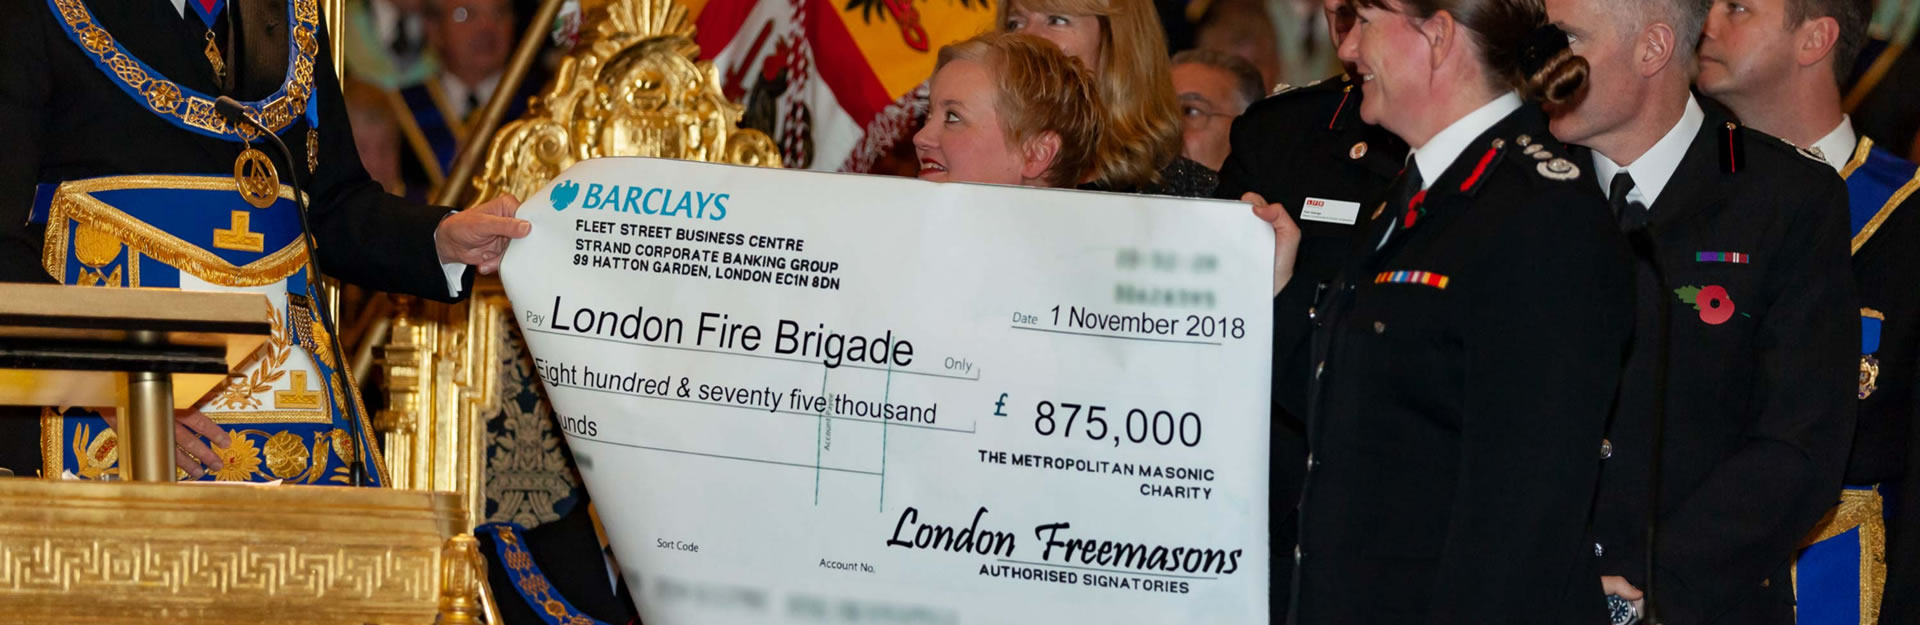 Freemasons Donation to London Fire Brigade